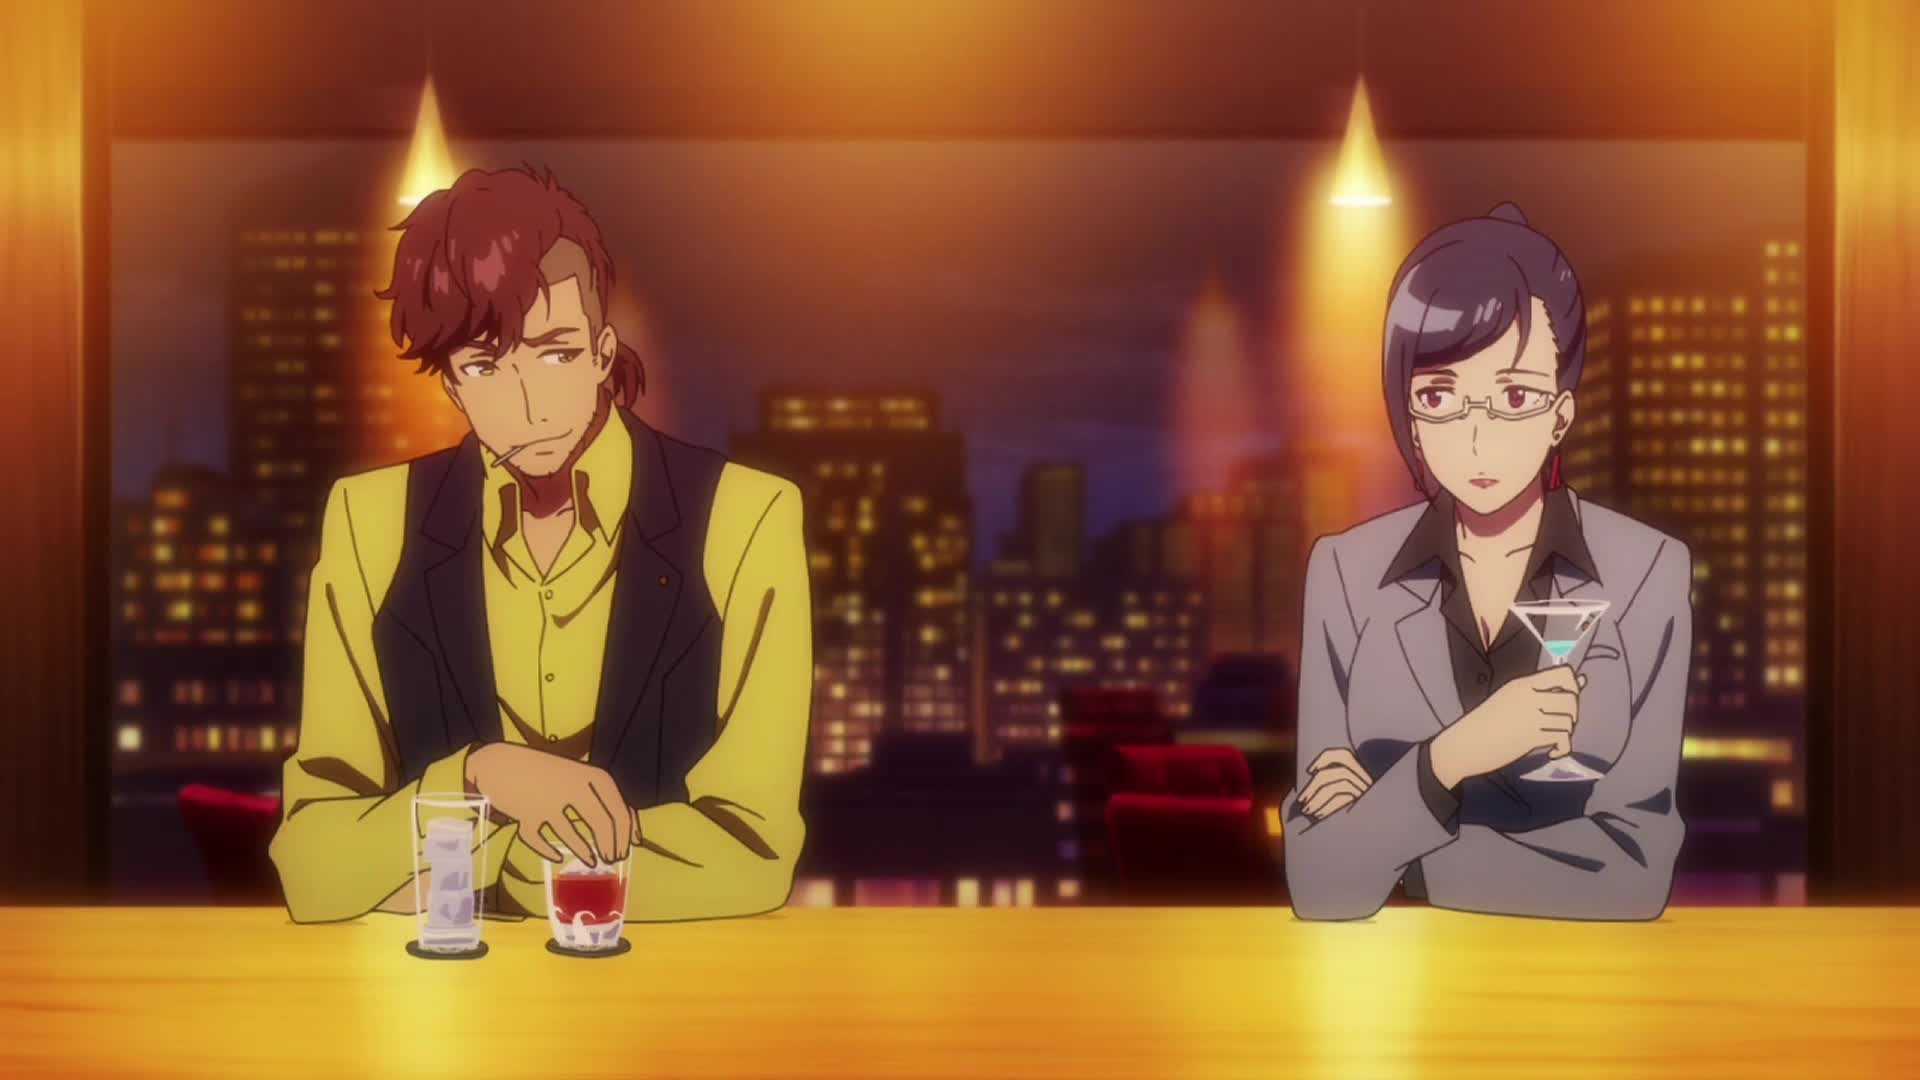 Anime irl GIFs